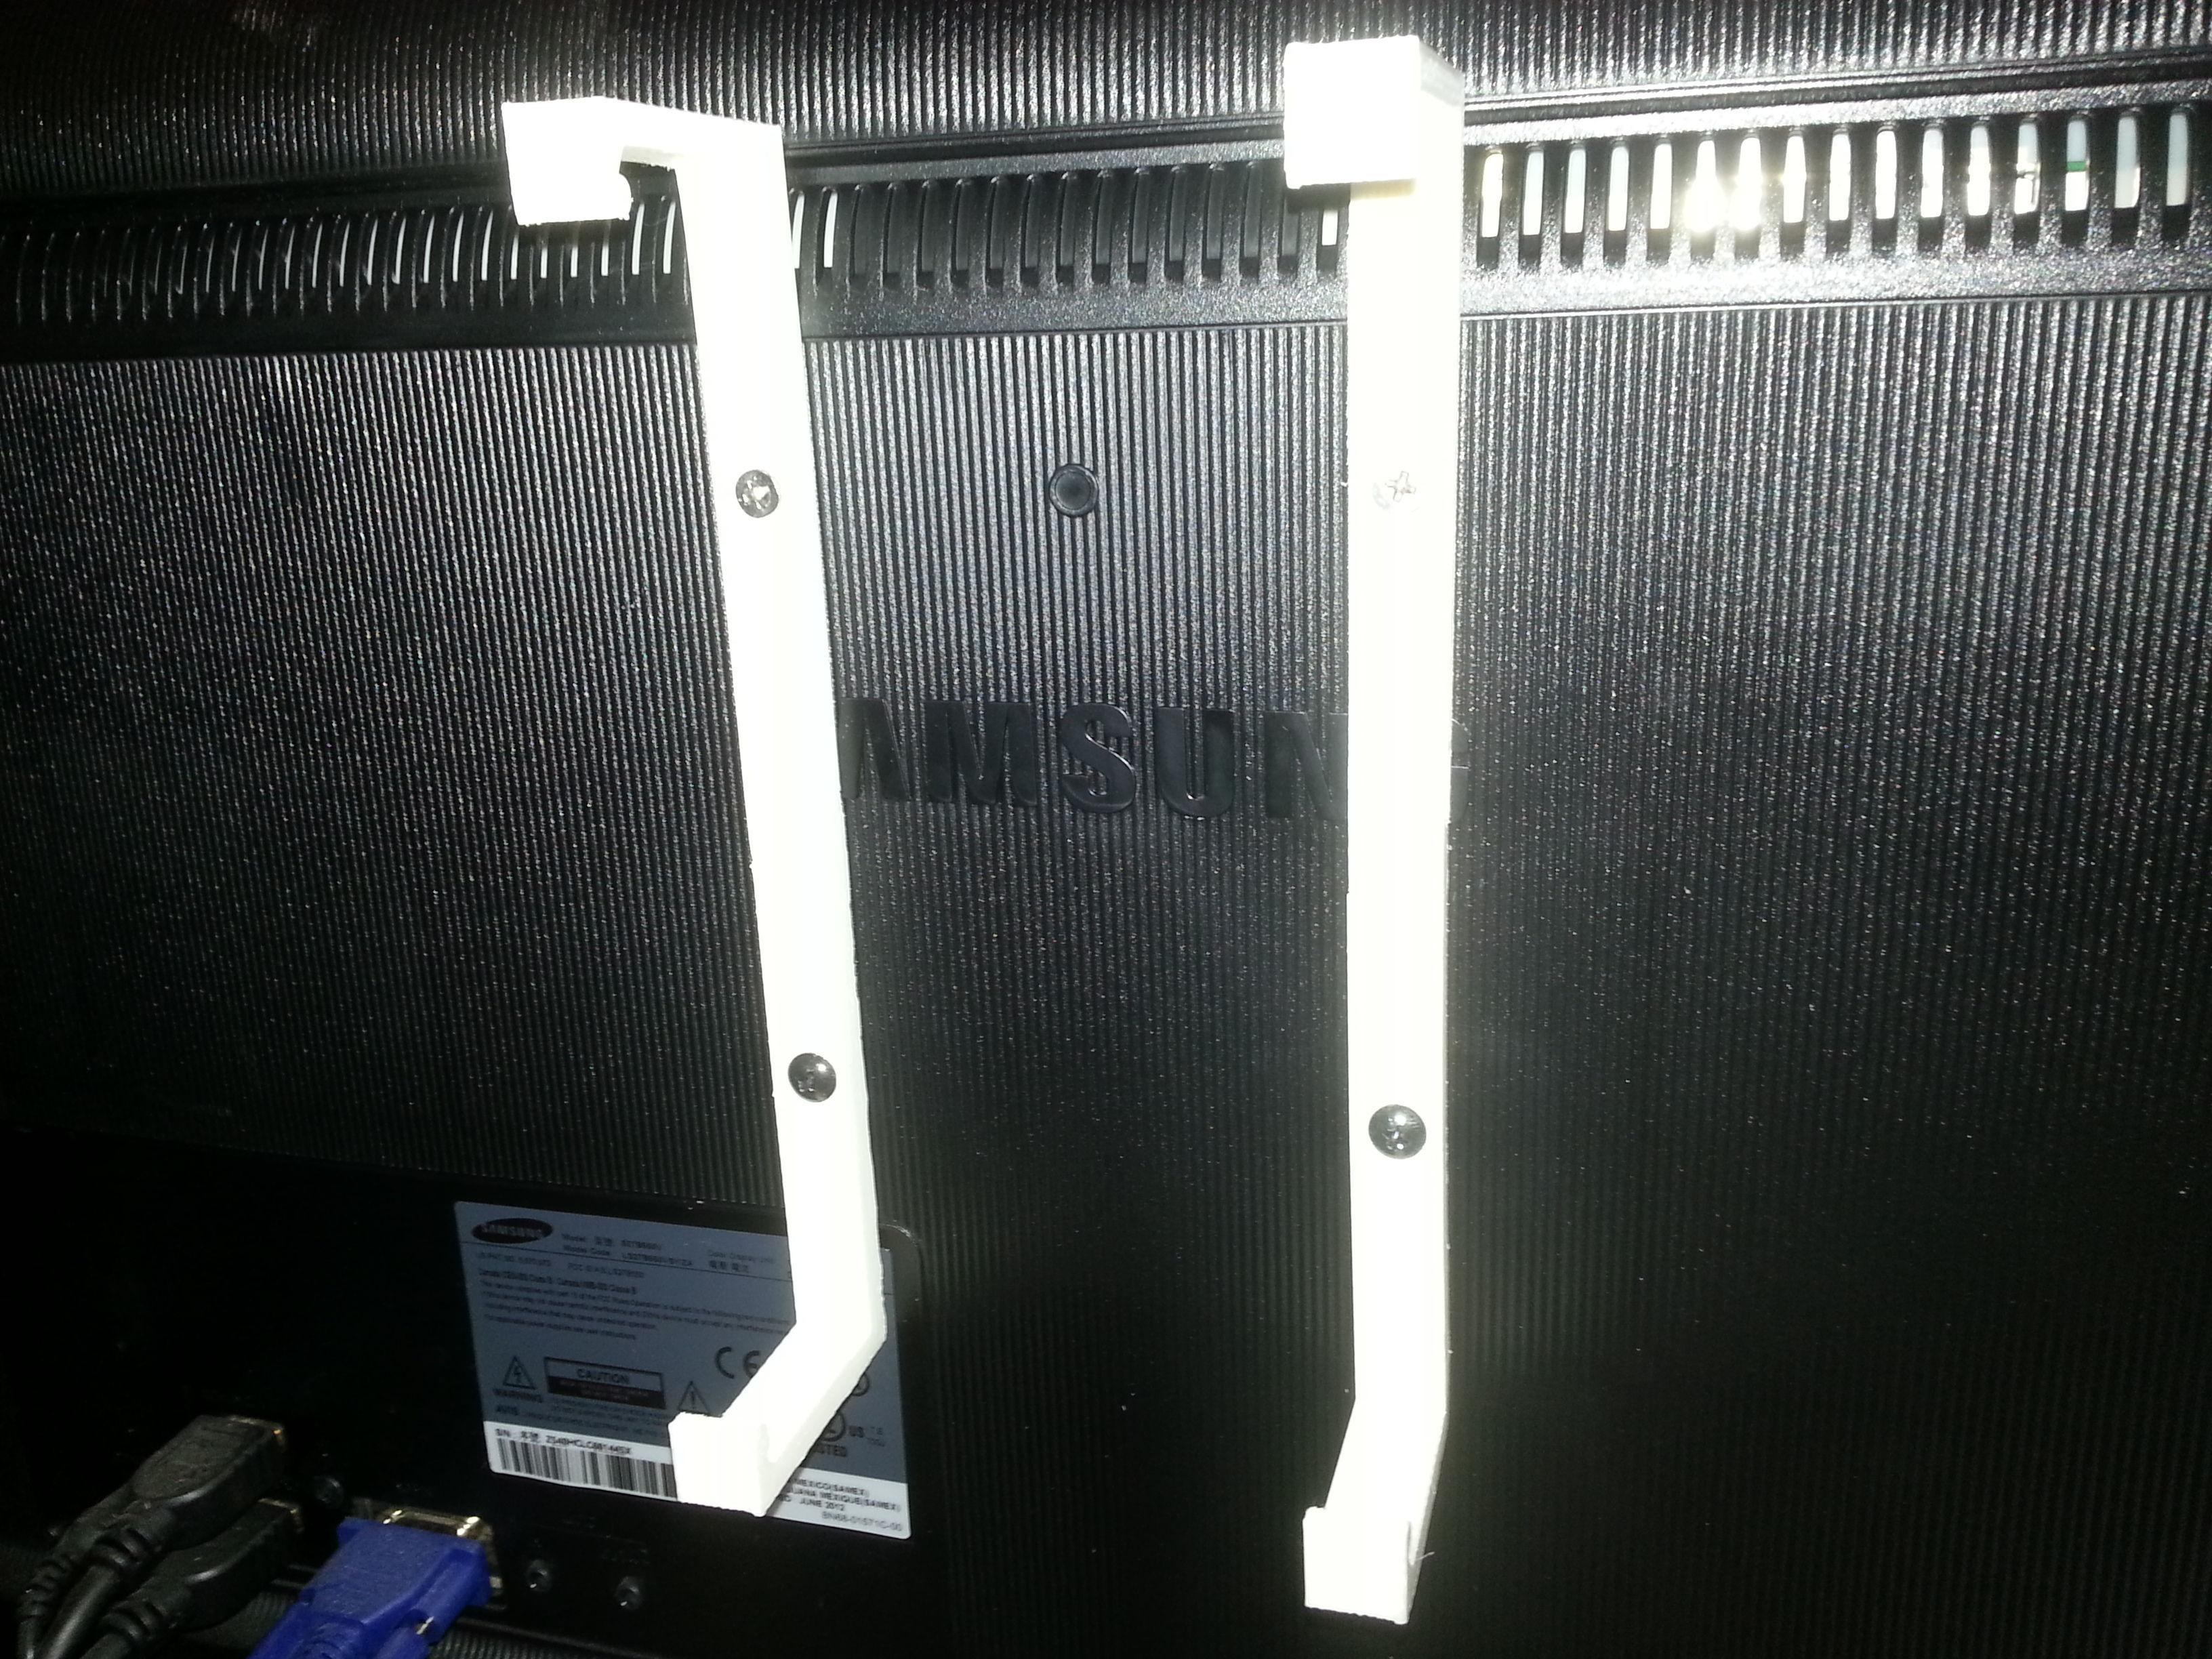 Mac Mini Monitor Bracket Free 3d Model 3d Printable Stl